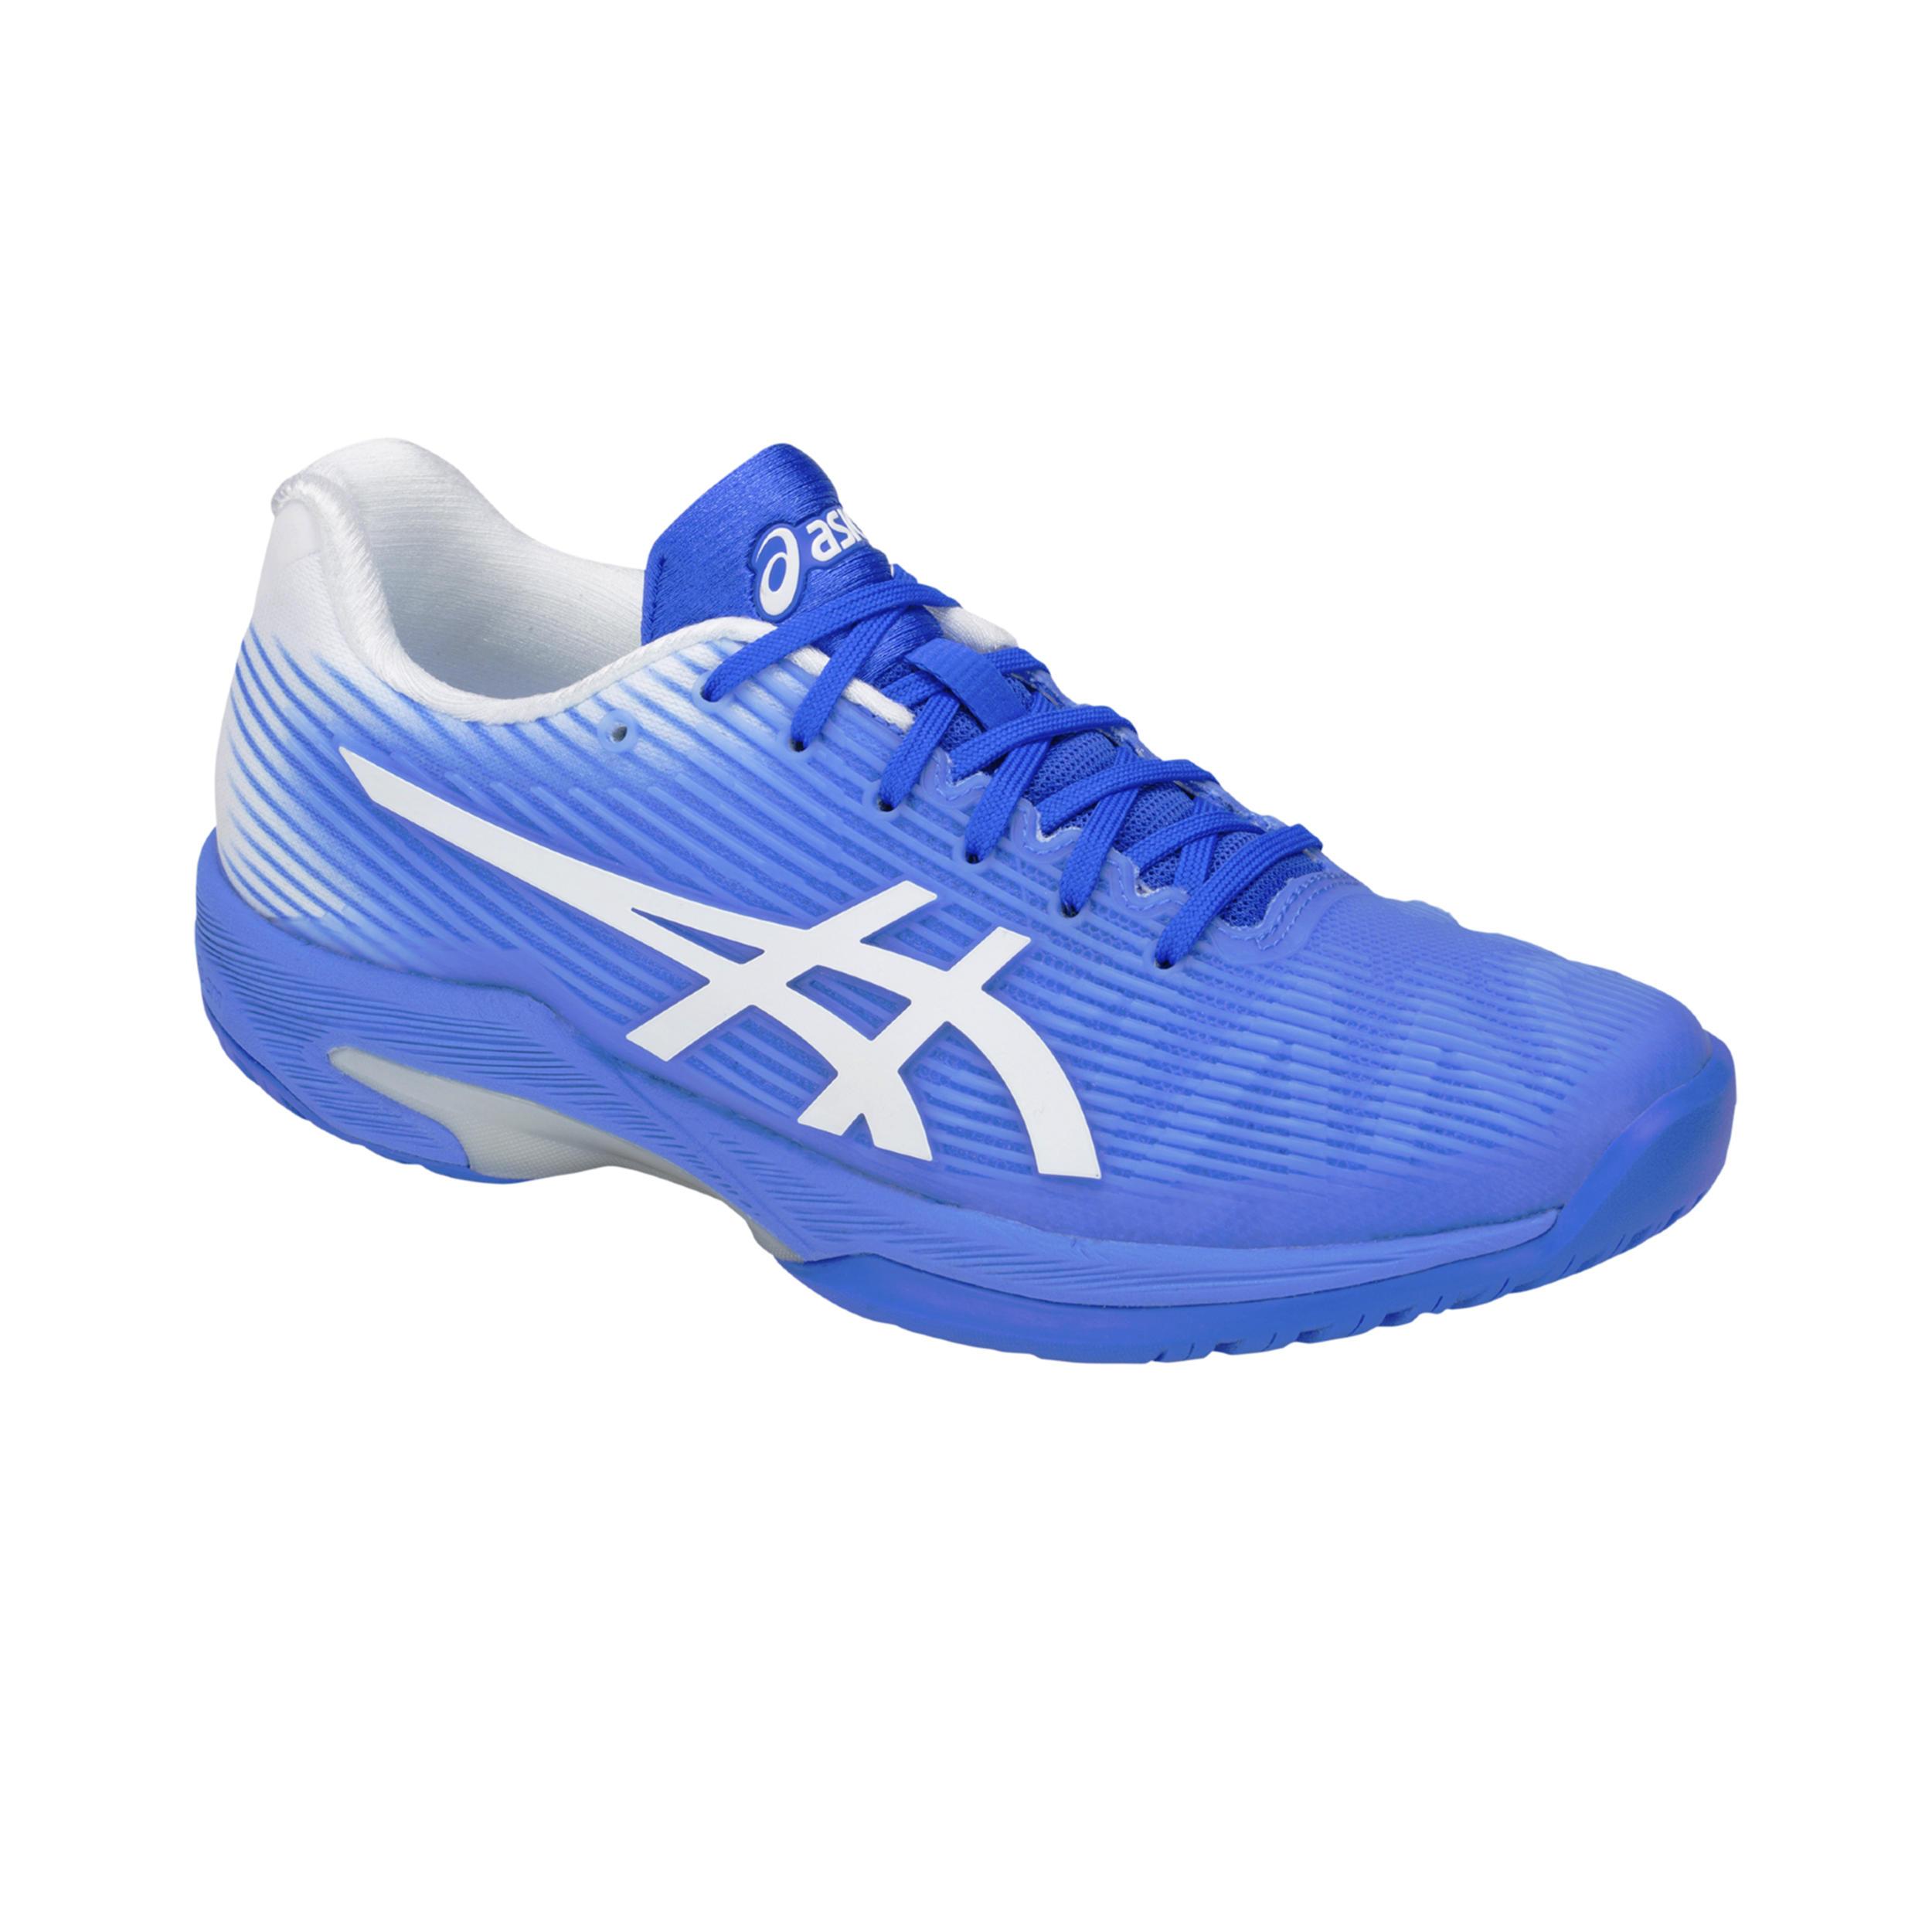 womens asics tennis shoes